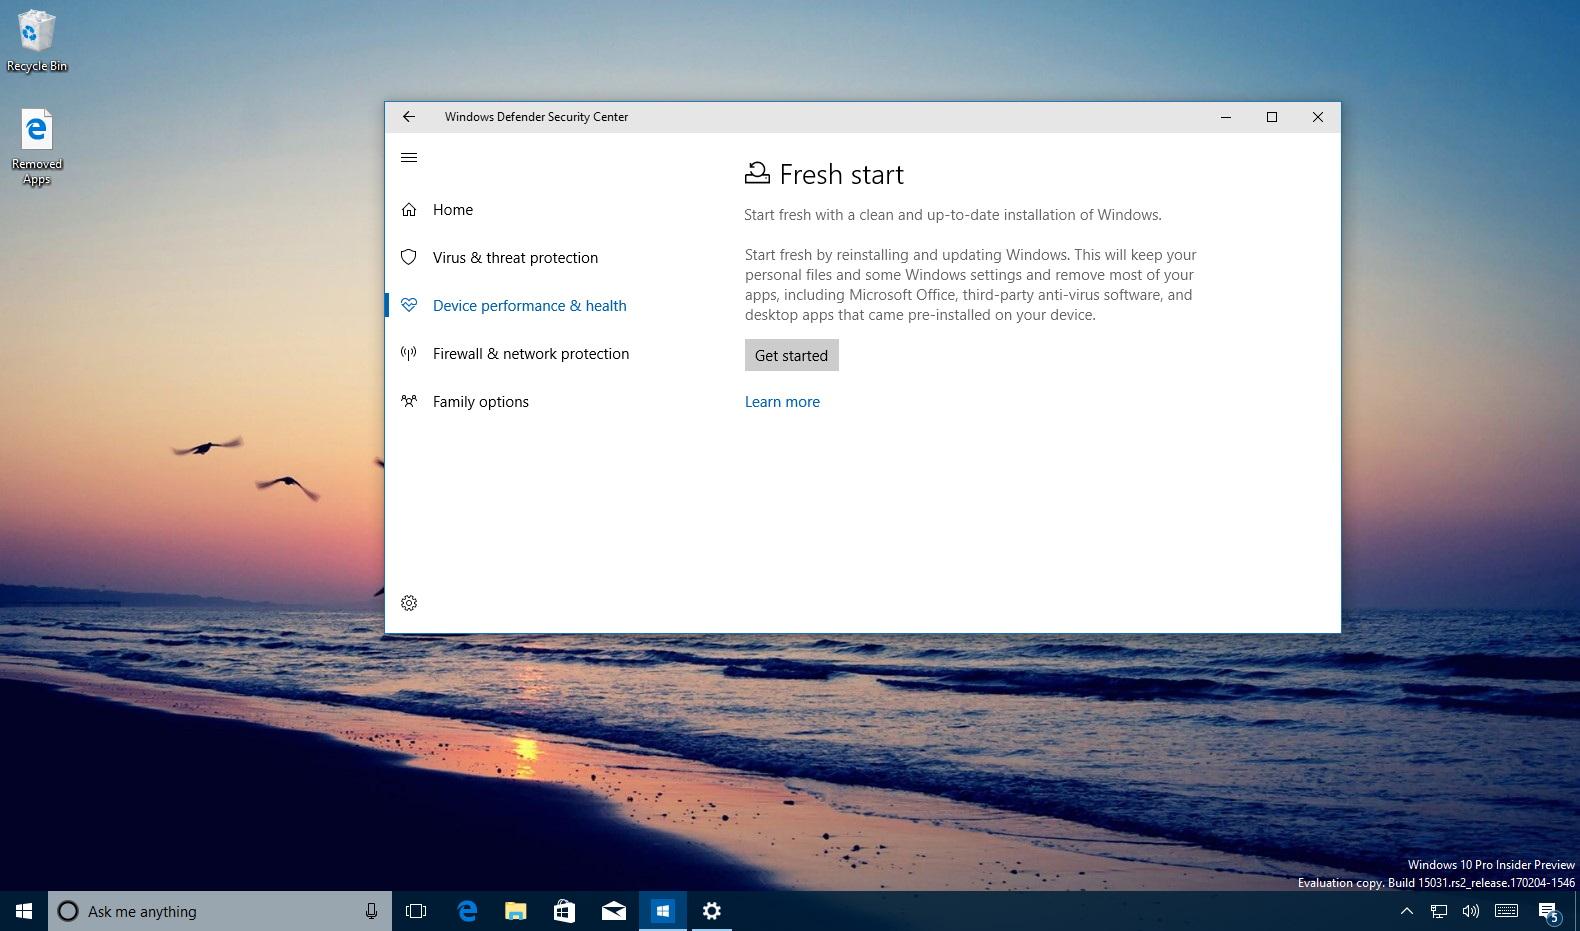 Reinstall and update Windows 10 using Windows Defender Security Center